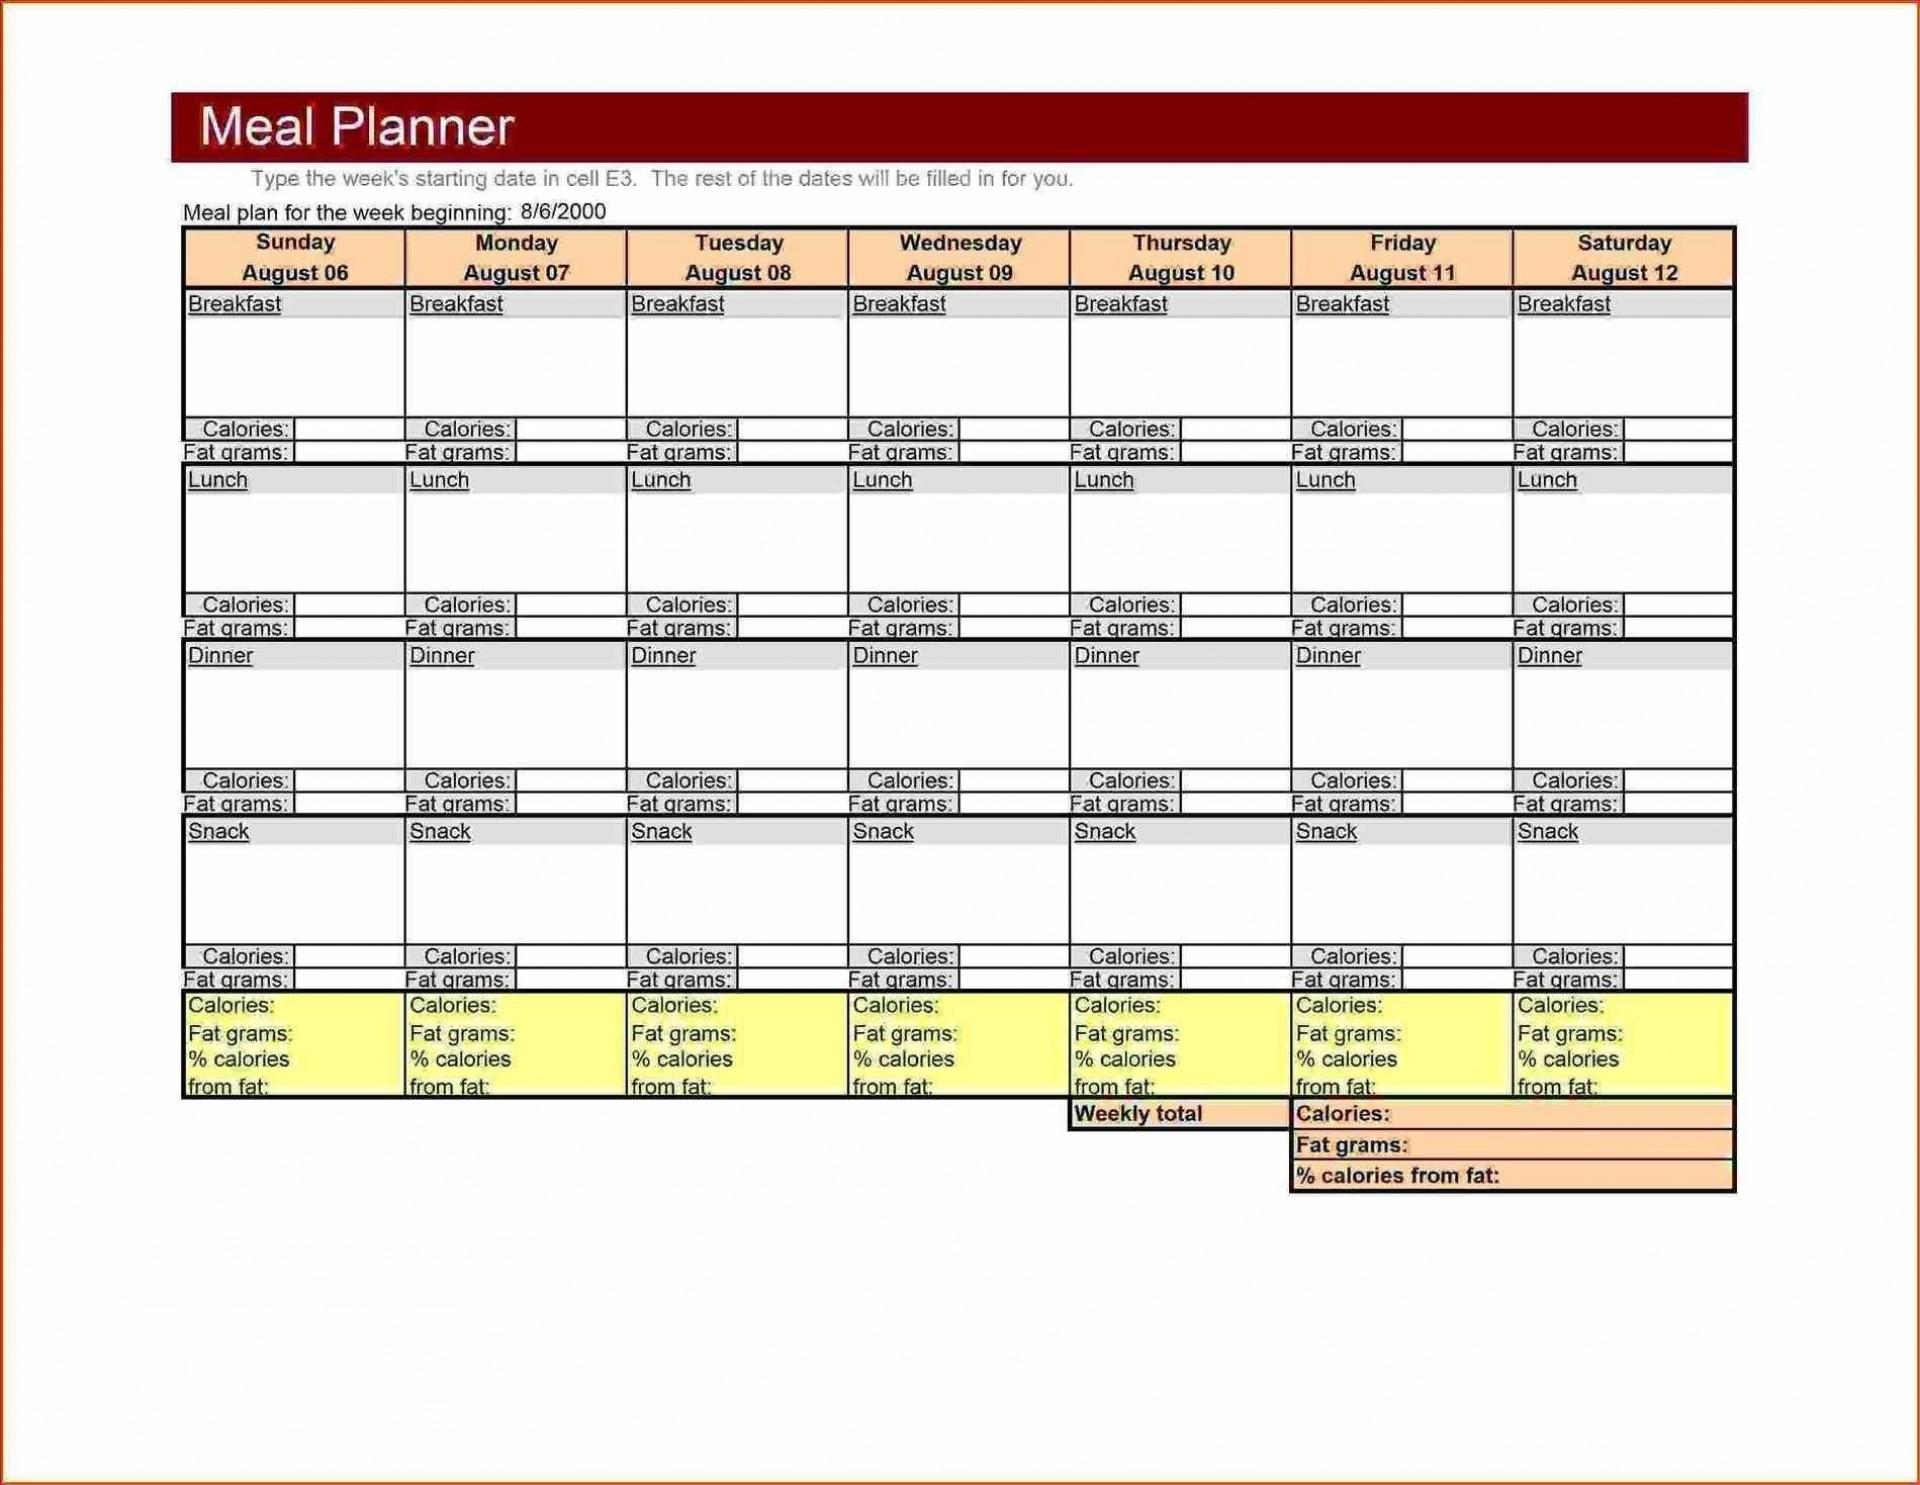 004 Incredible Weekly Meal Planner Template Excel High Def  Downloadable Plan Editable1920